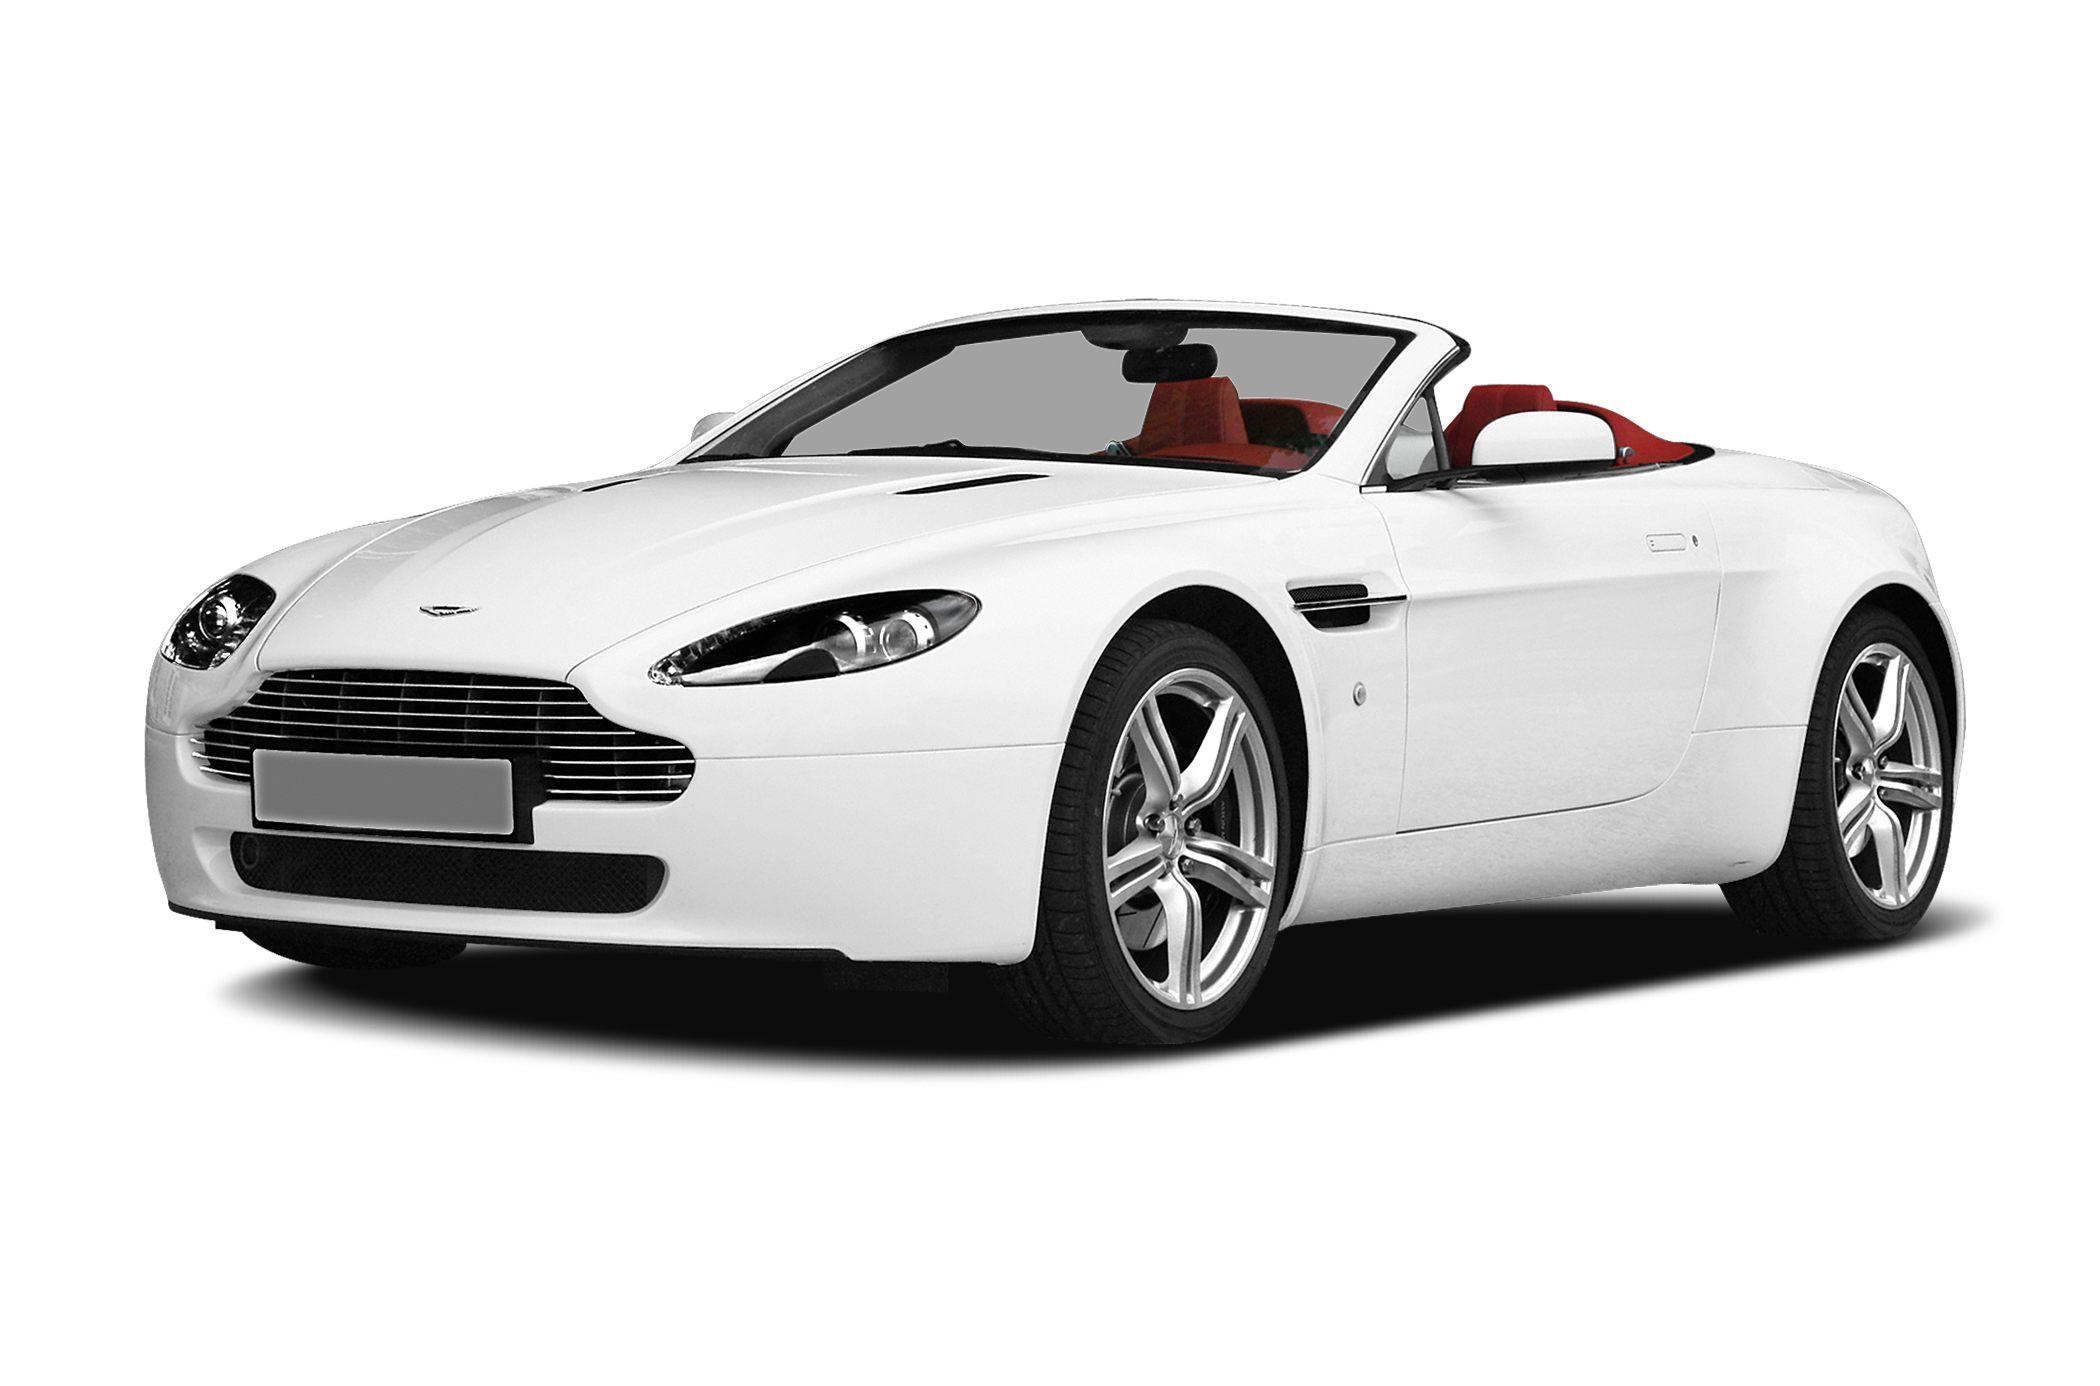 2009 Aston Martin V8 Vantage Base 2dr Roadster Specs And Prices